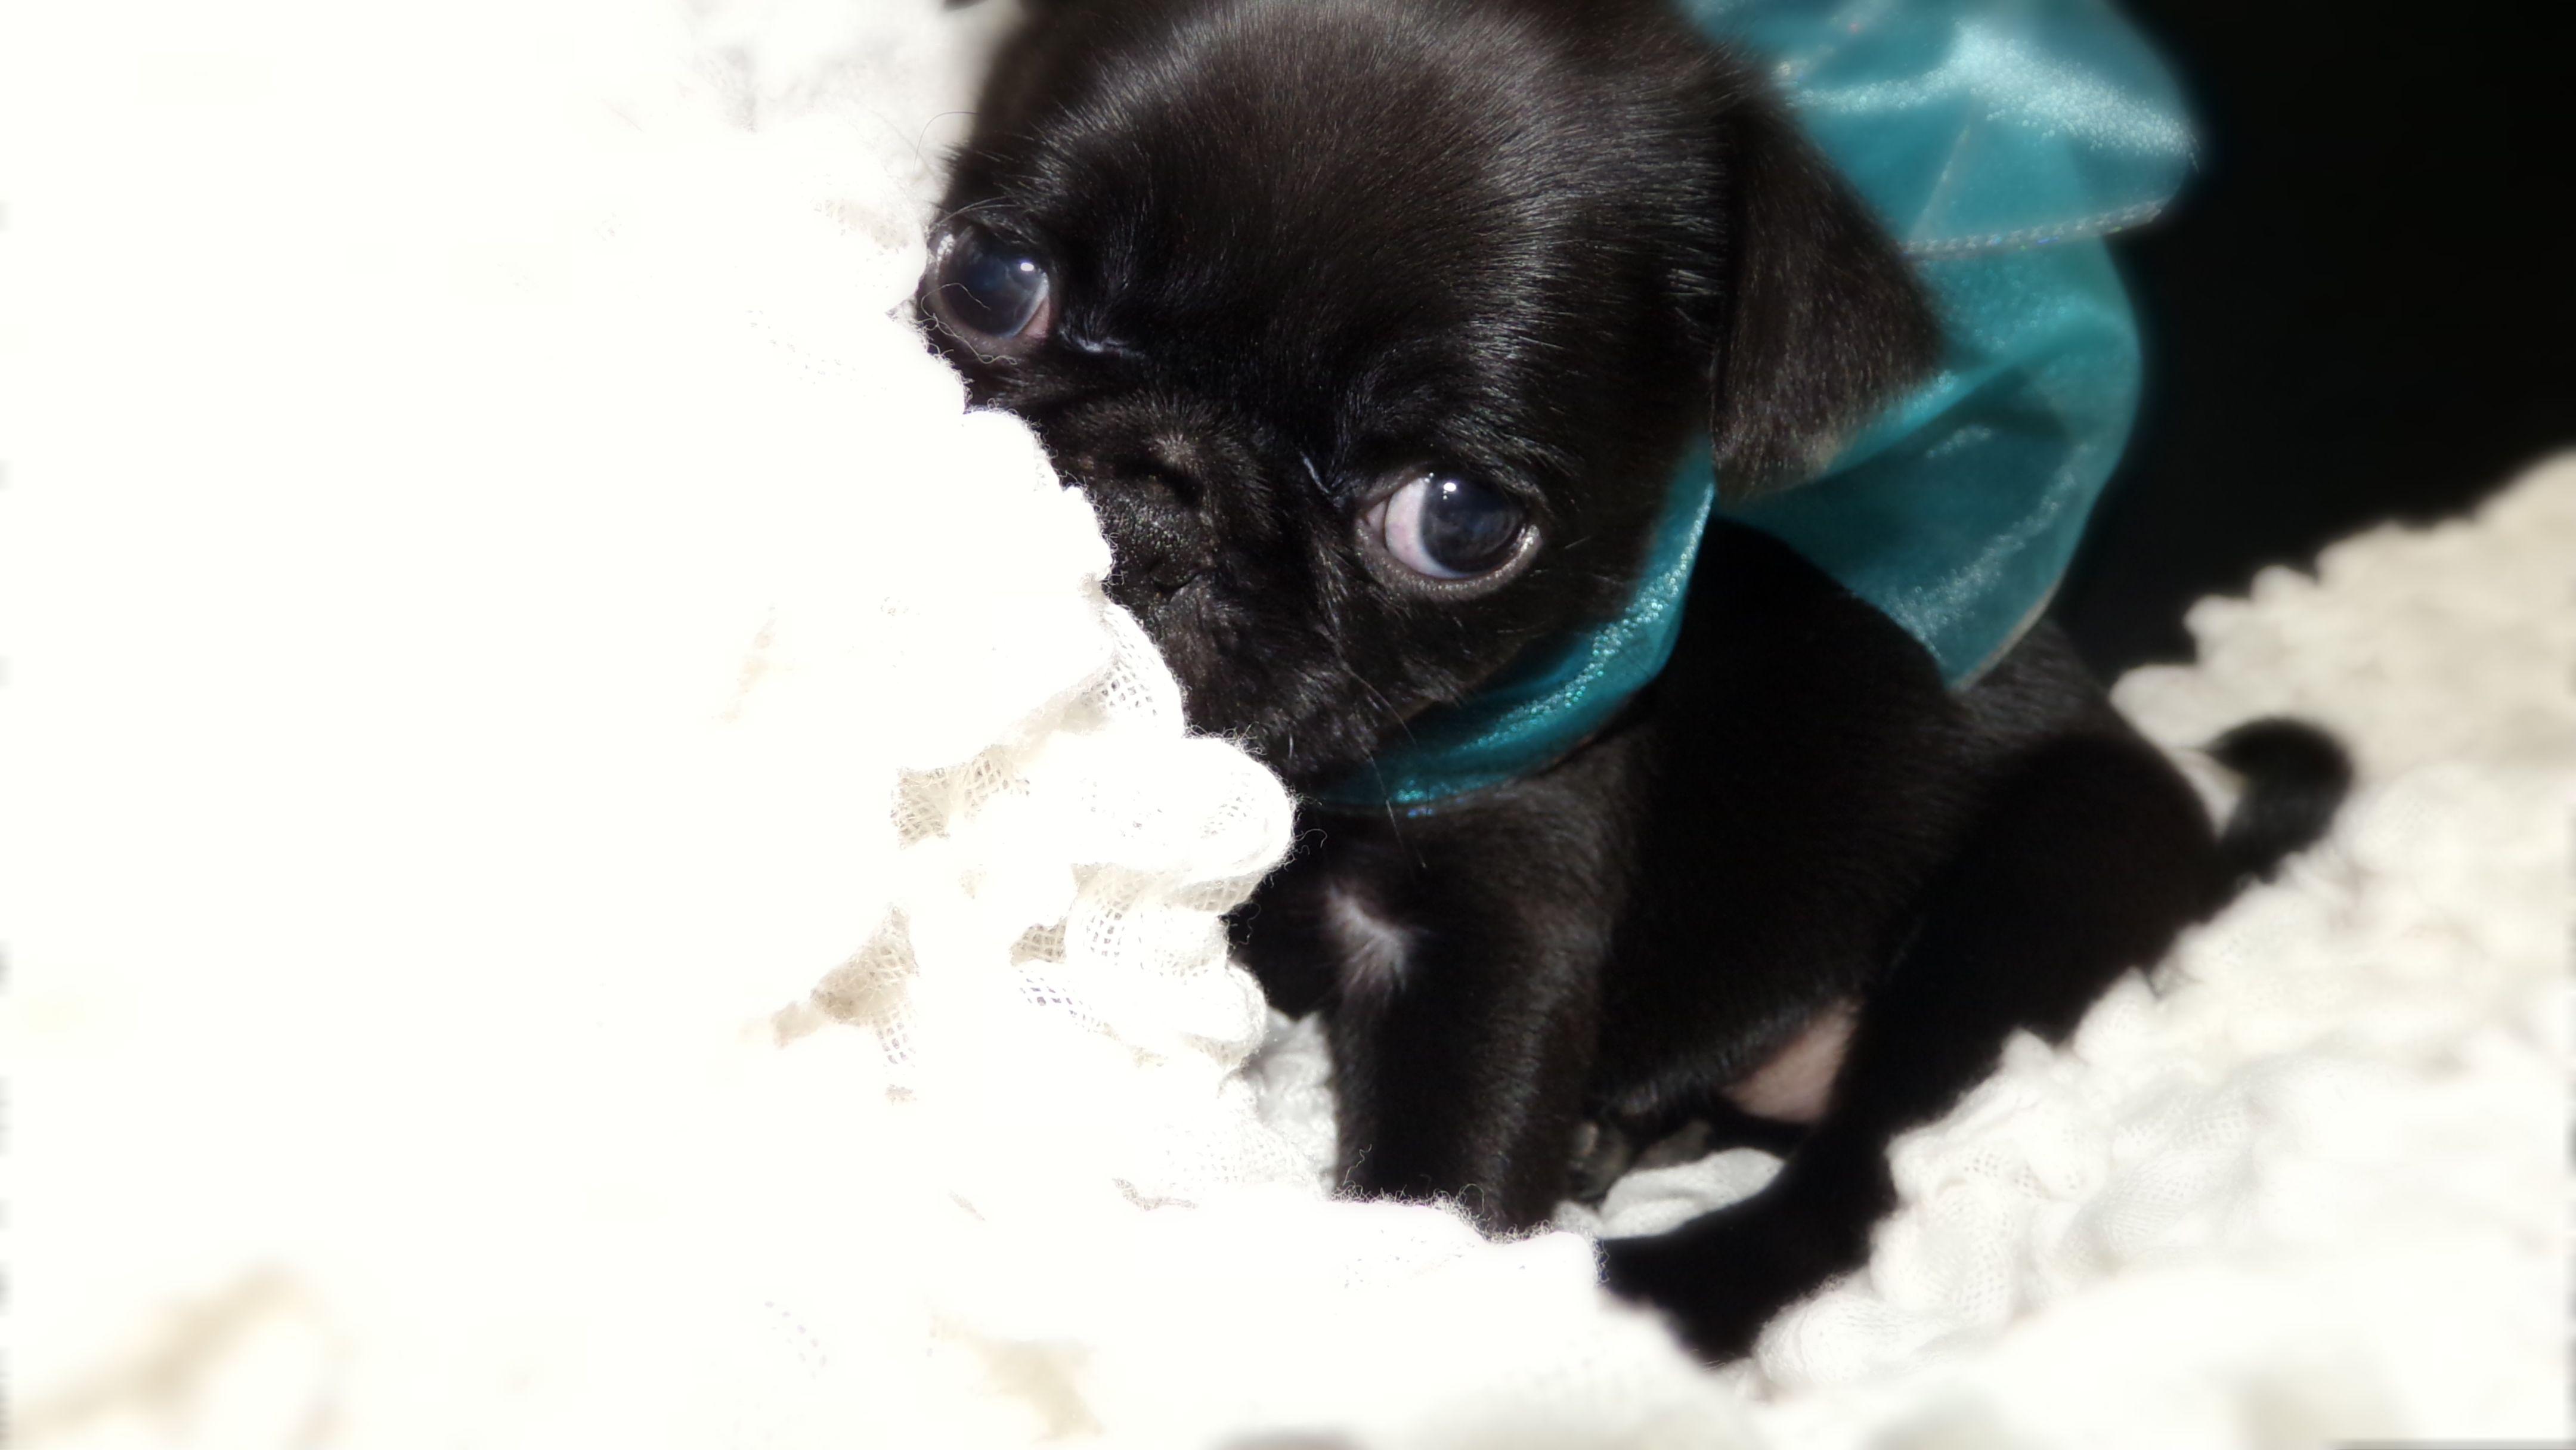 Theodore My Toy Black Pug Puppy X Pug Puppies Black Pug